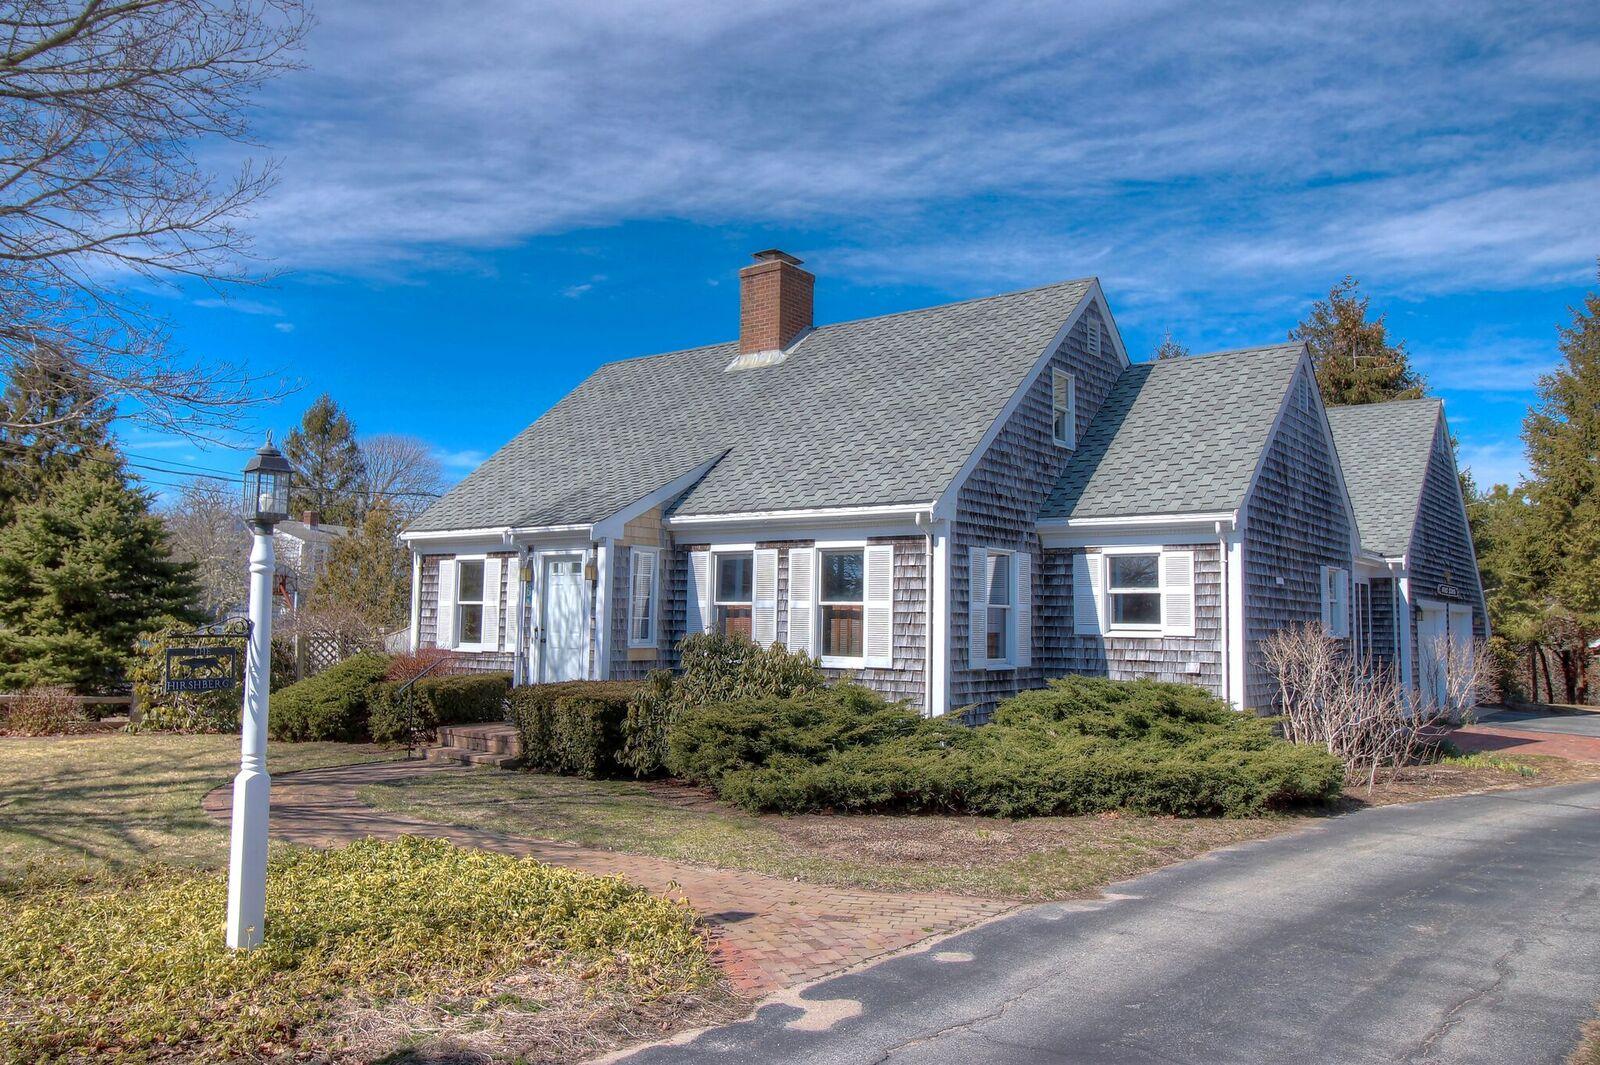 Single Family Home for Sale at 6 Sunrise Lane, Harwich, MA Harwich, Massachusetts, 02661 United States